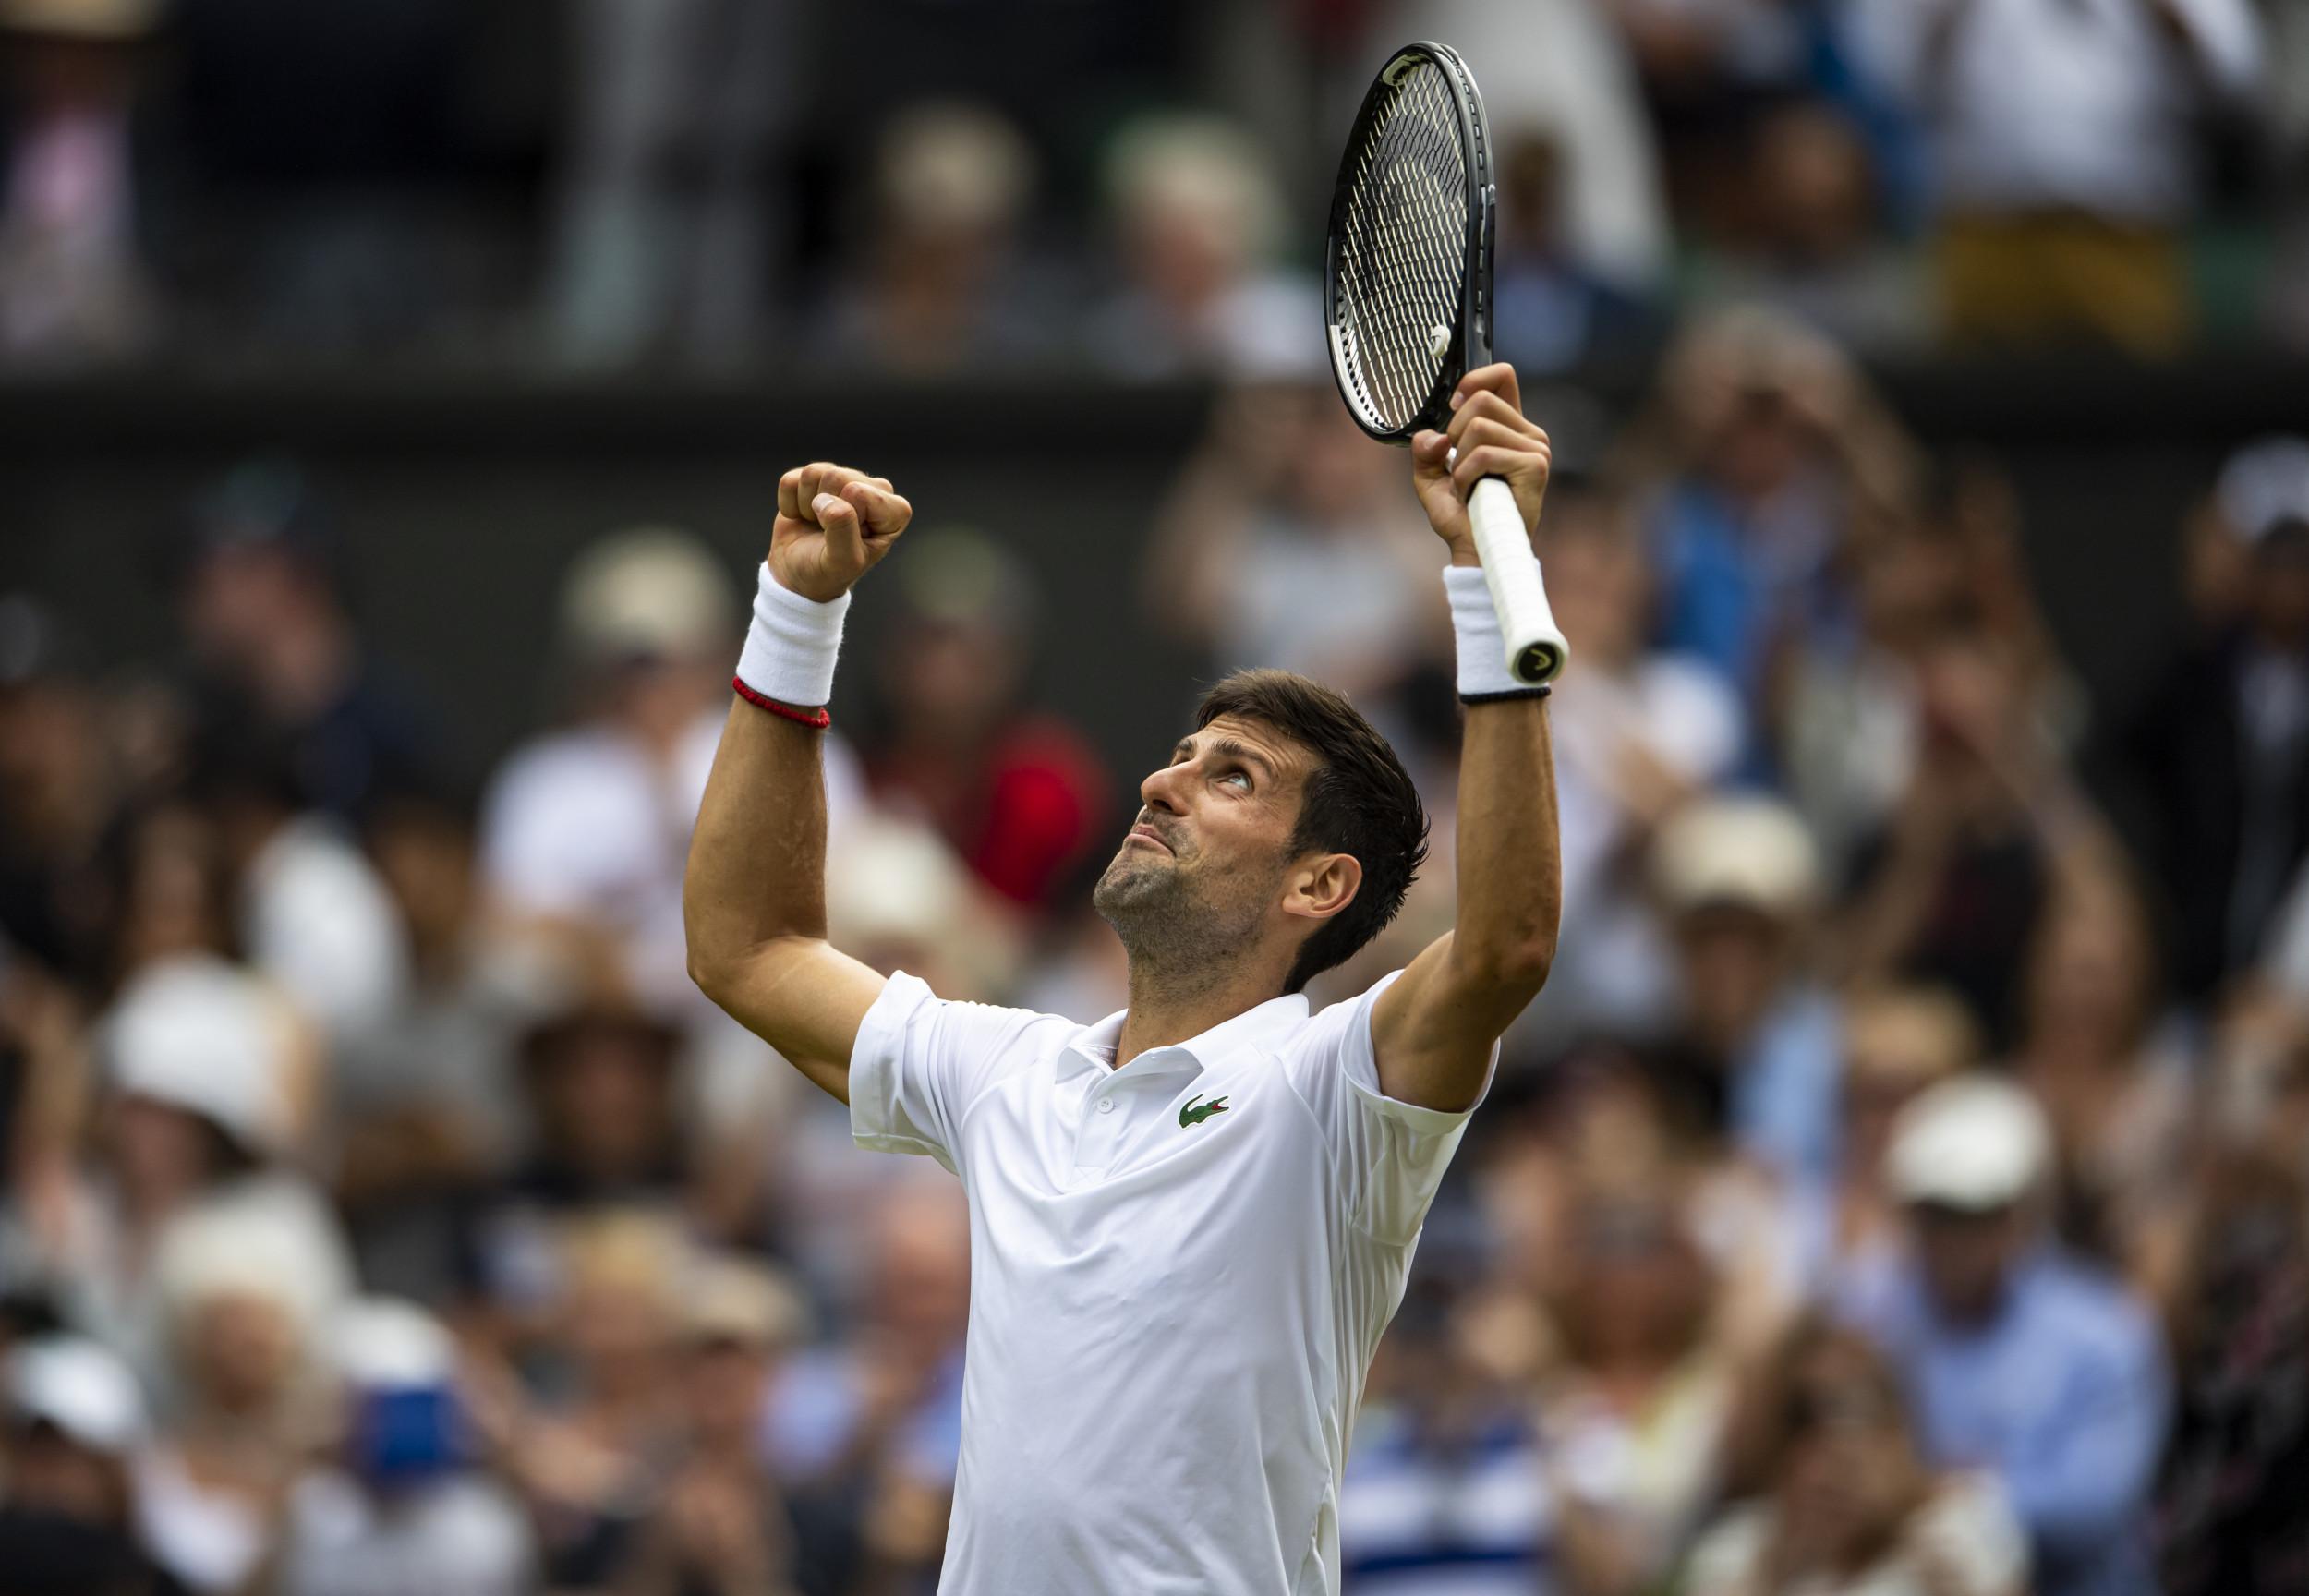 Wimbledon 2019 Where To Watch Novak Djokovic Vs Roberto Bautista Agut Semifinal Start Time Live Stream And Odds